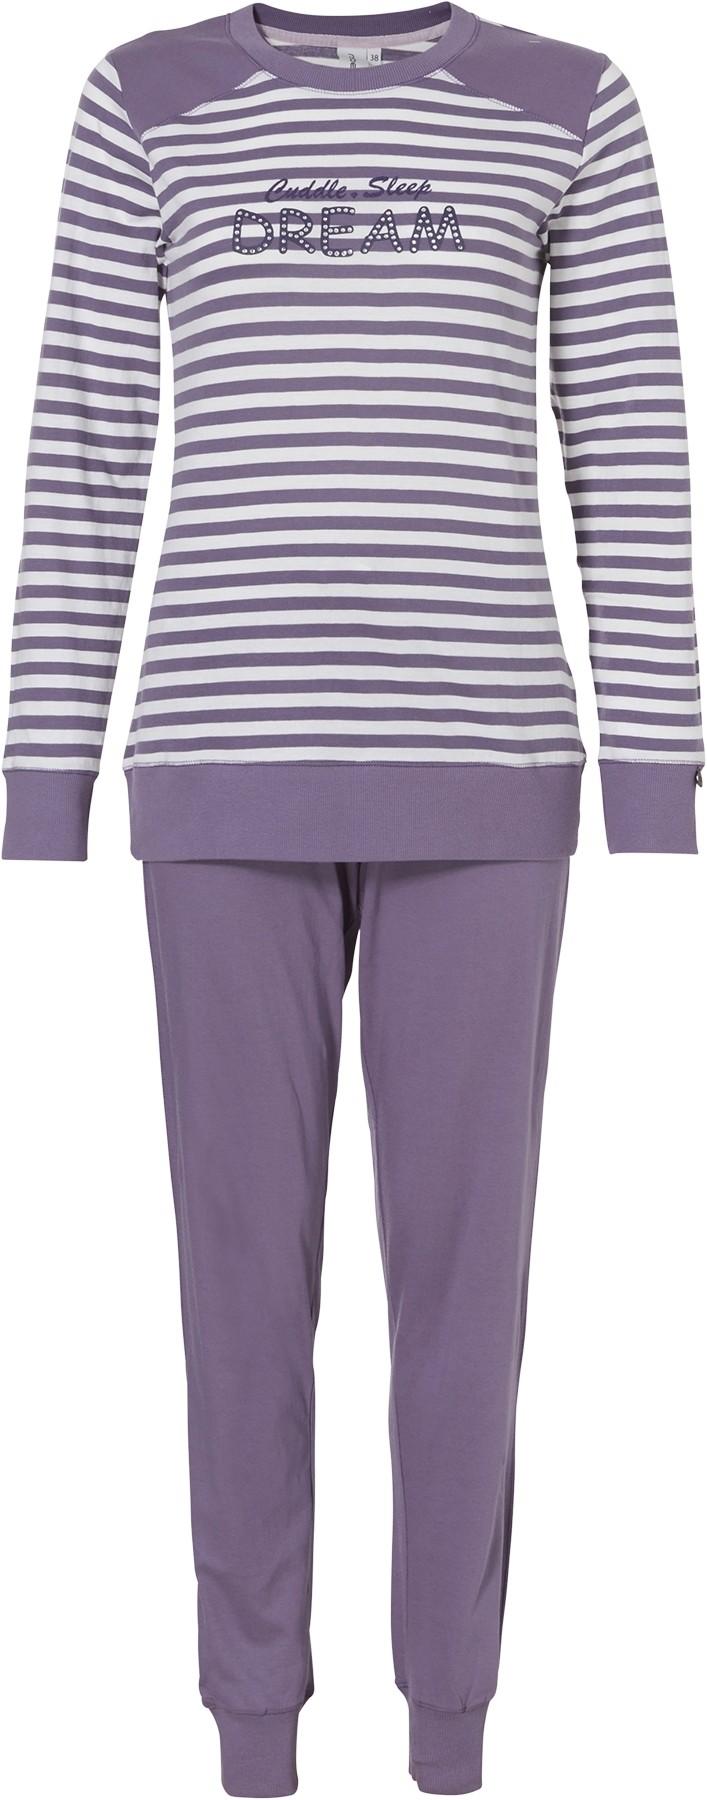 Dames pyjama Rebelle 2172-215-2-40